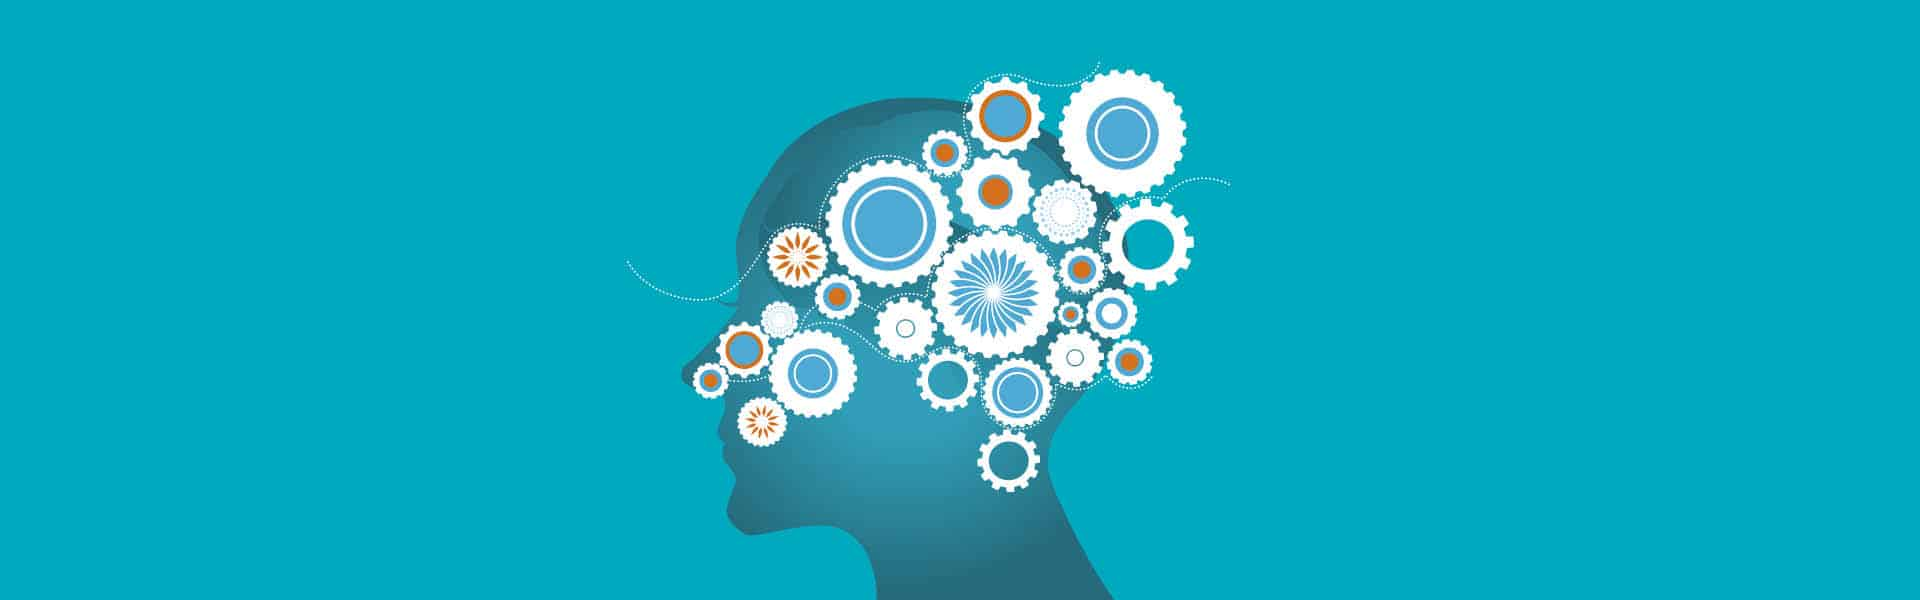 Psykologi og psykiatri